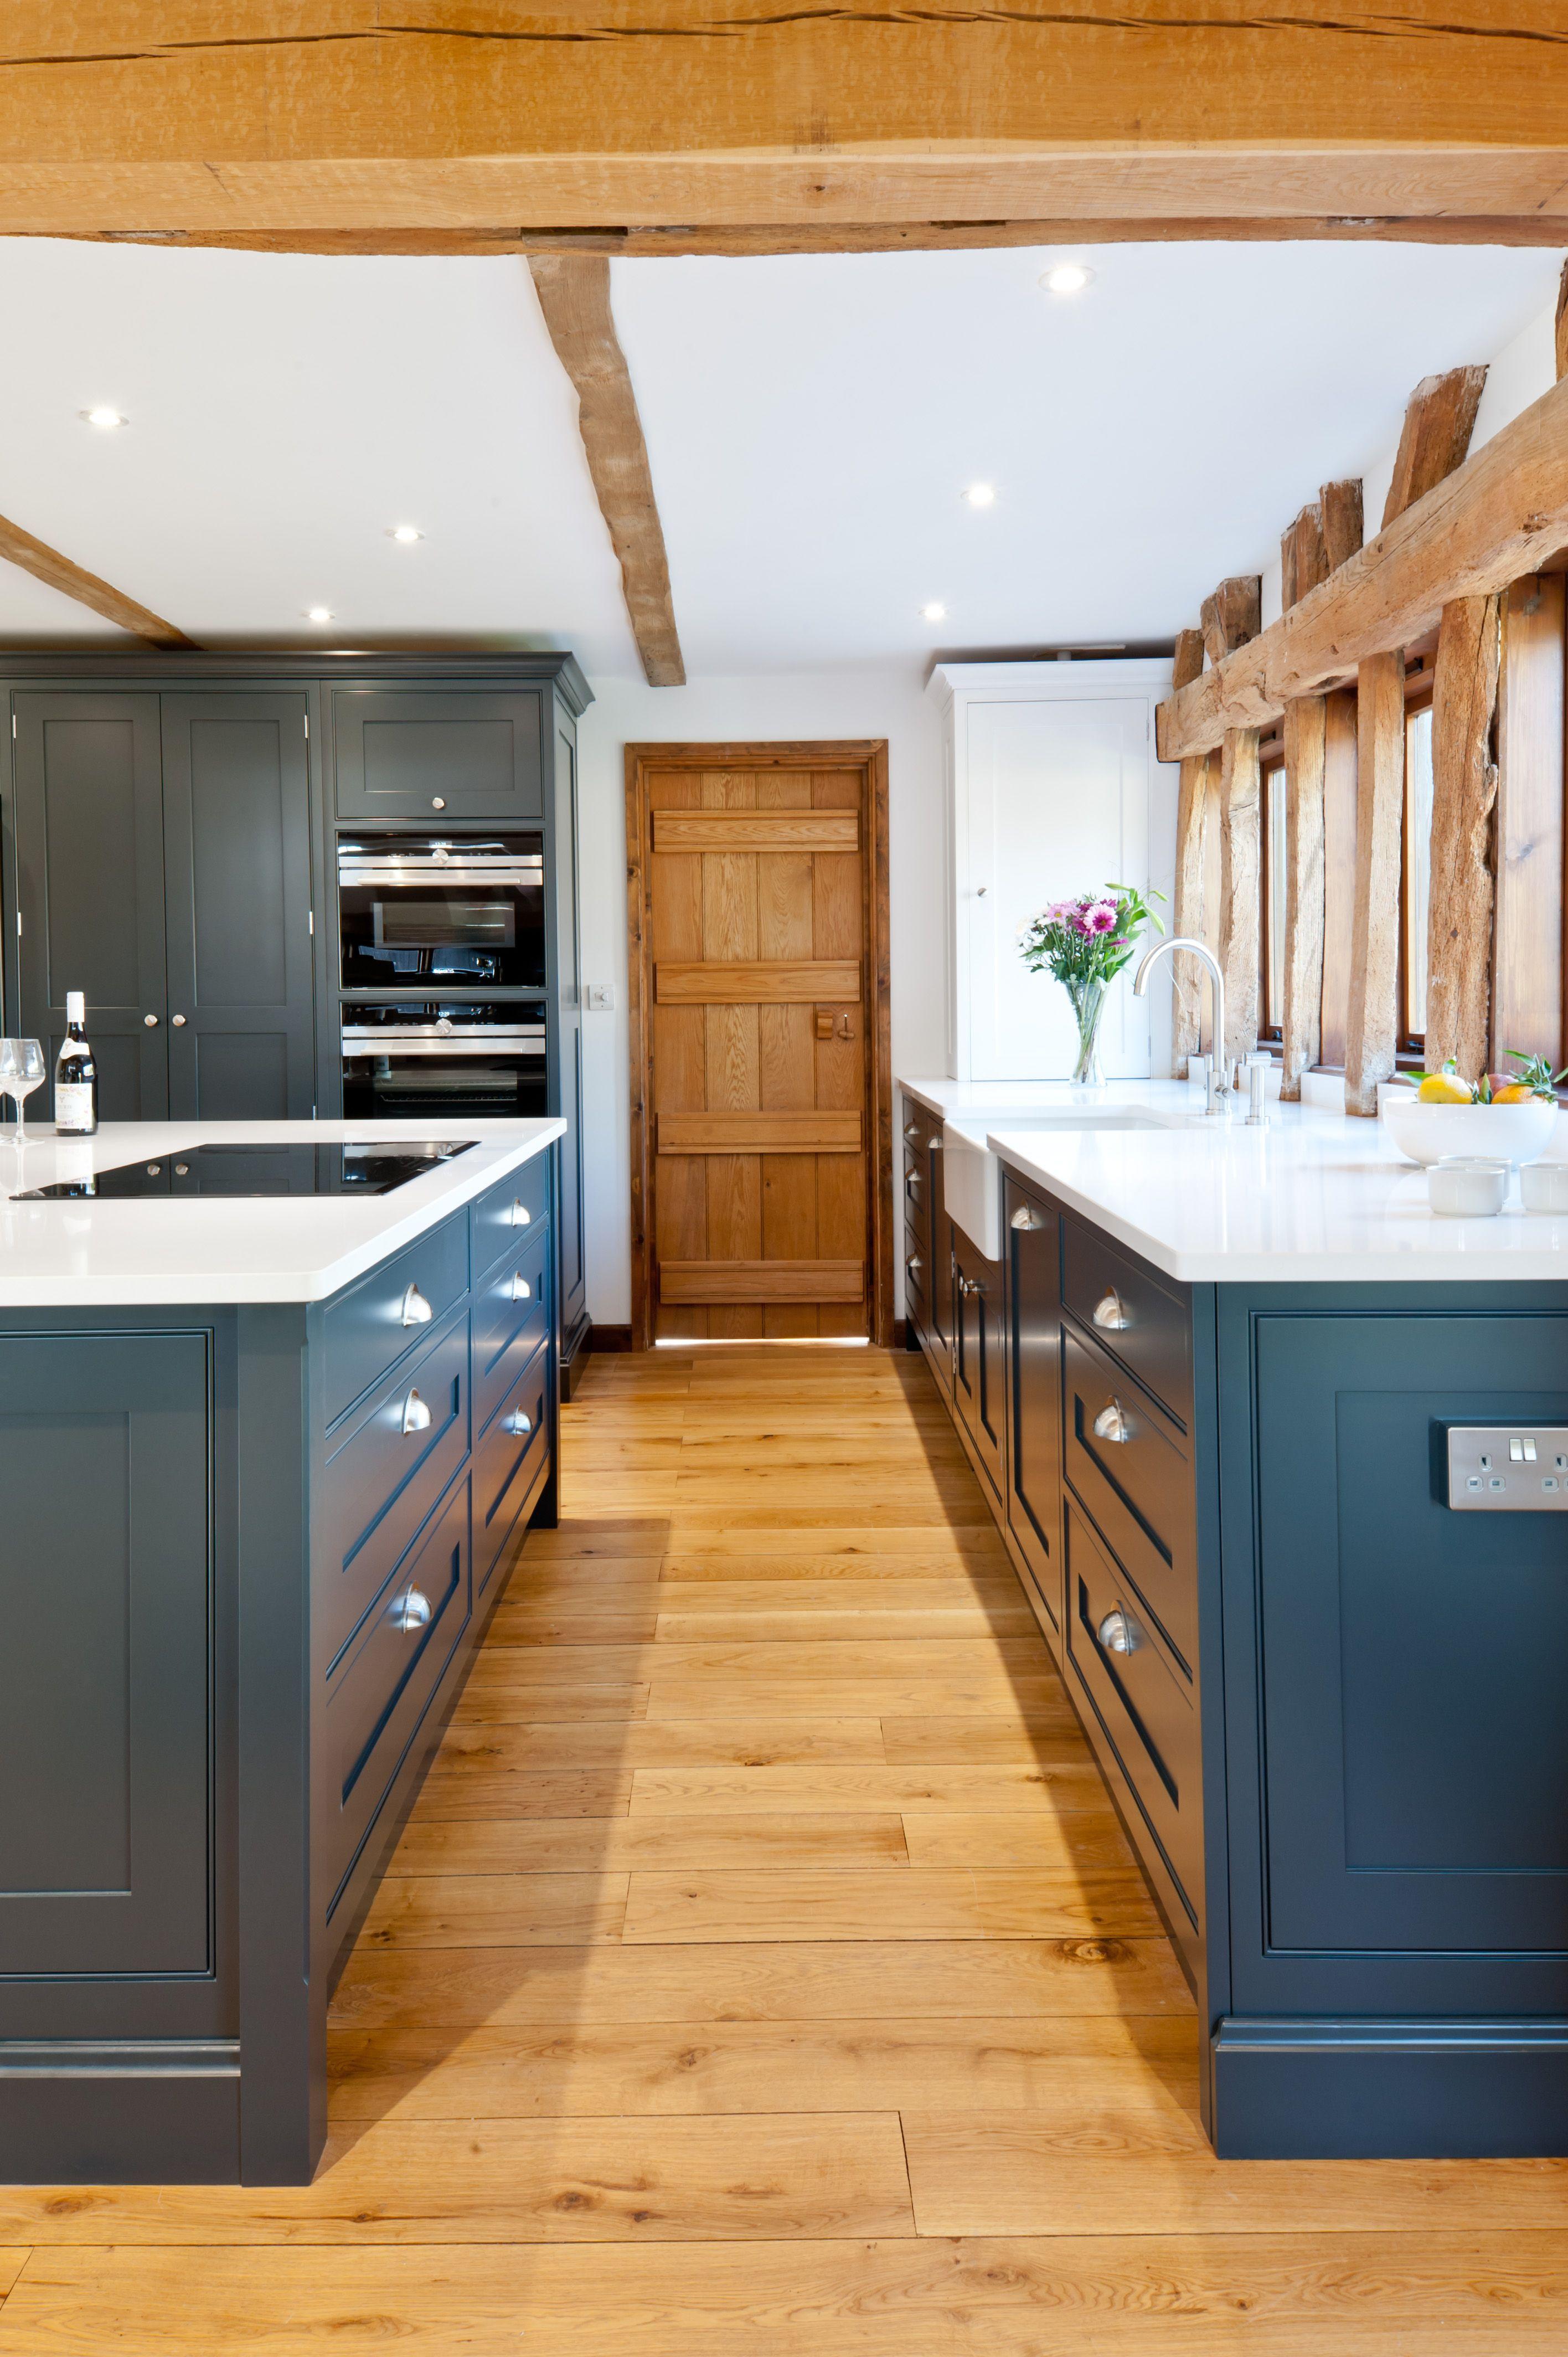 A Thoroughly Bespoke Kitchen Minimal Kitchen Design Bespoke Kitchen Design Kitchen Remodel